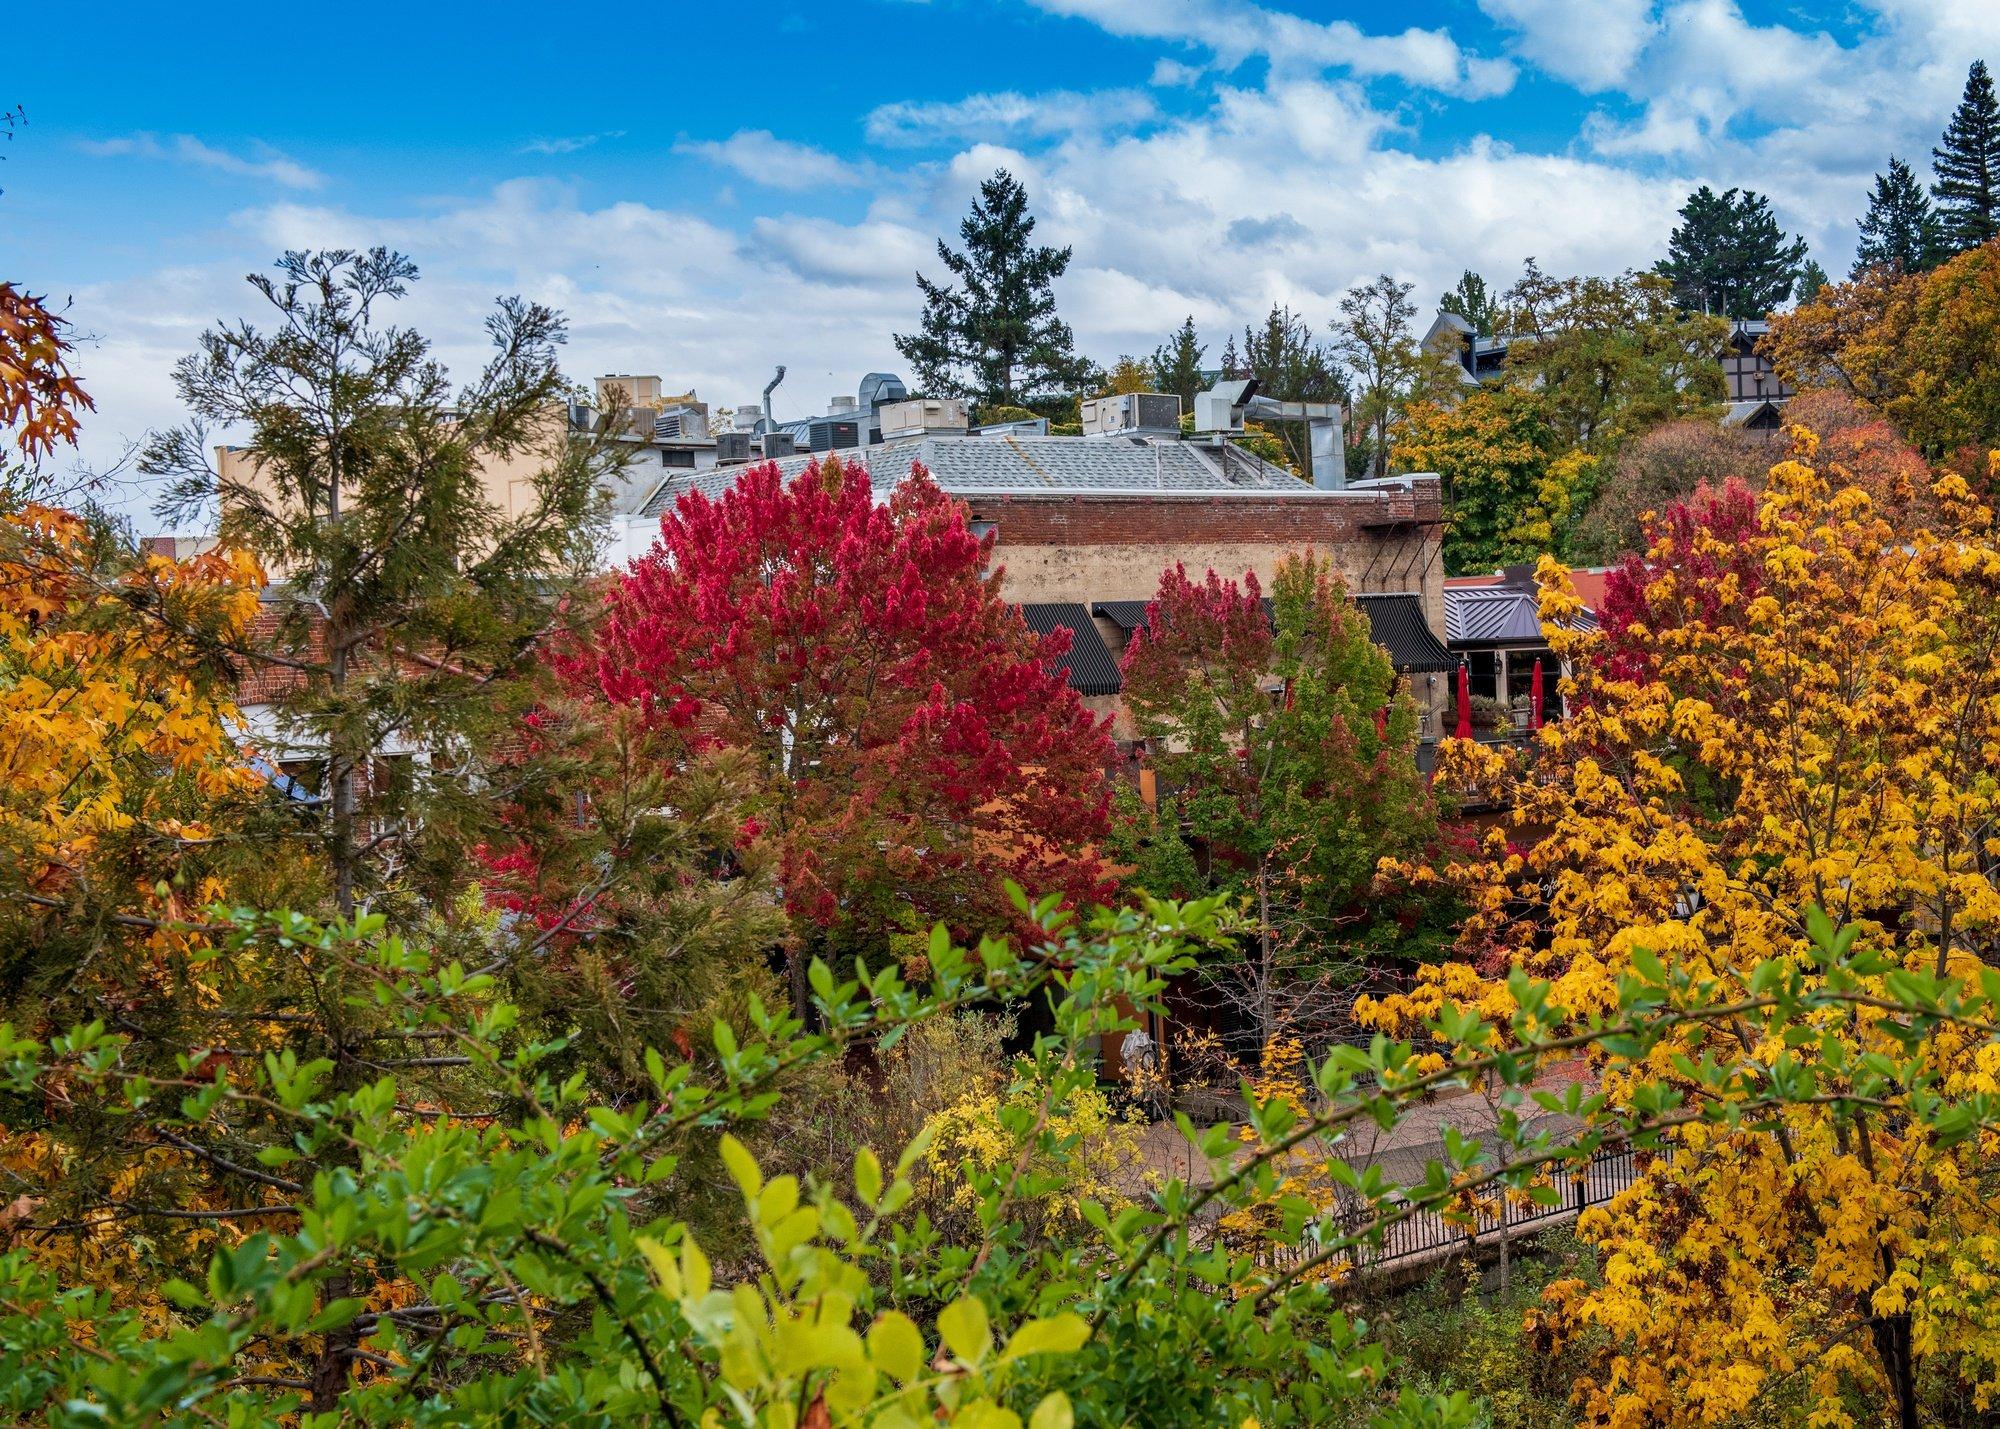 Lithia Park in Ashland, Oregon